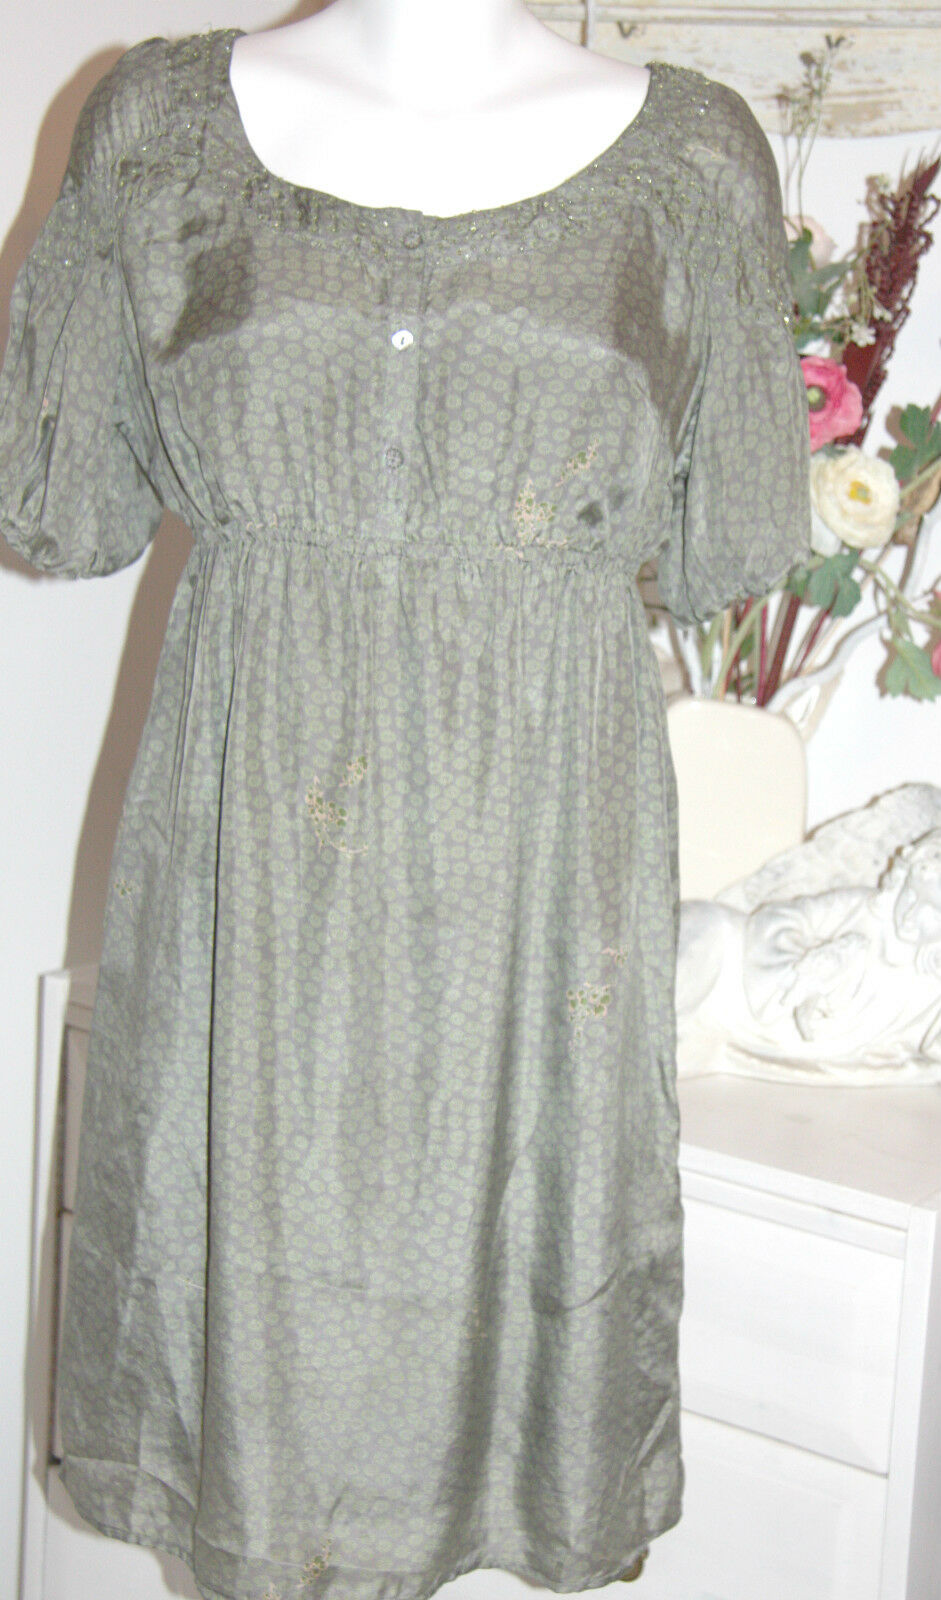 Noa Noa  Kleid  Kurzarm Dress Silk Shibuya silk light cedar  Größe  S Neu